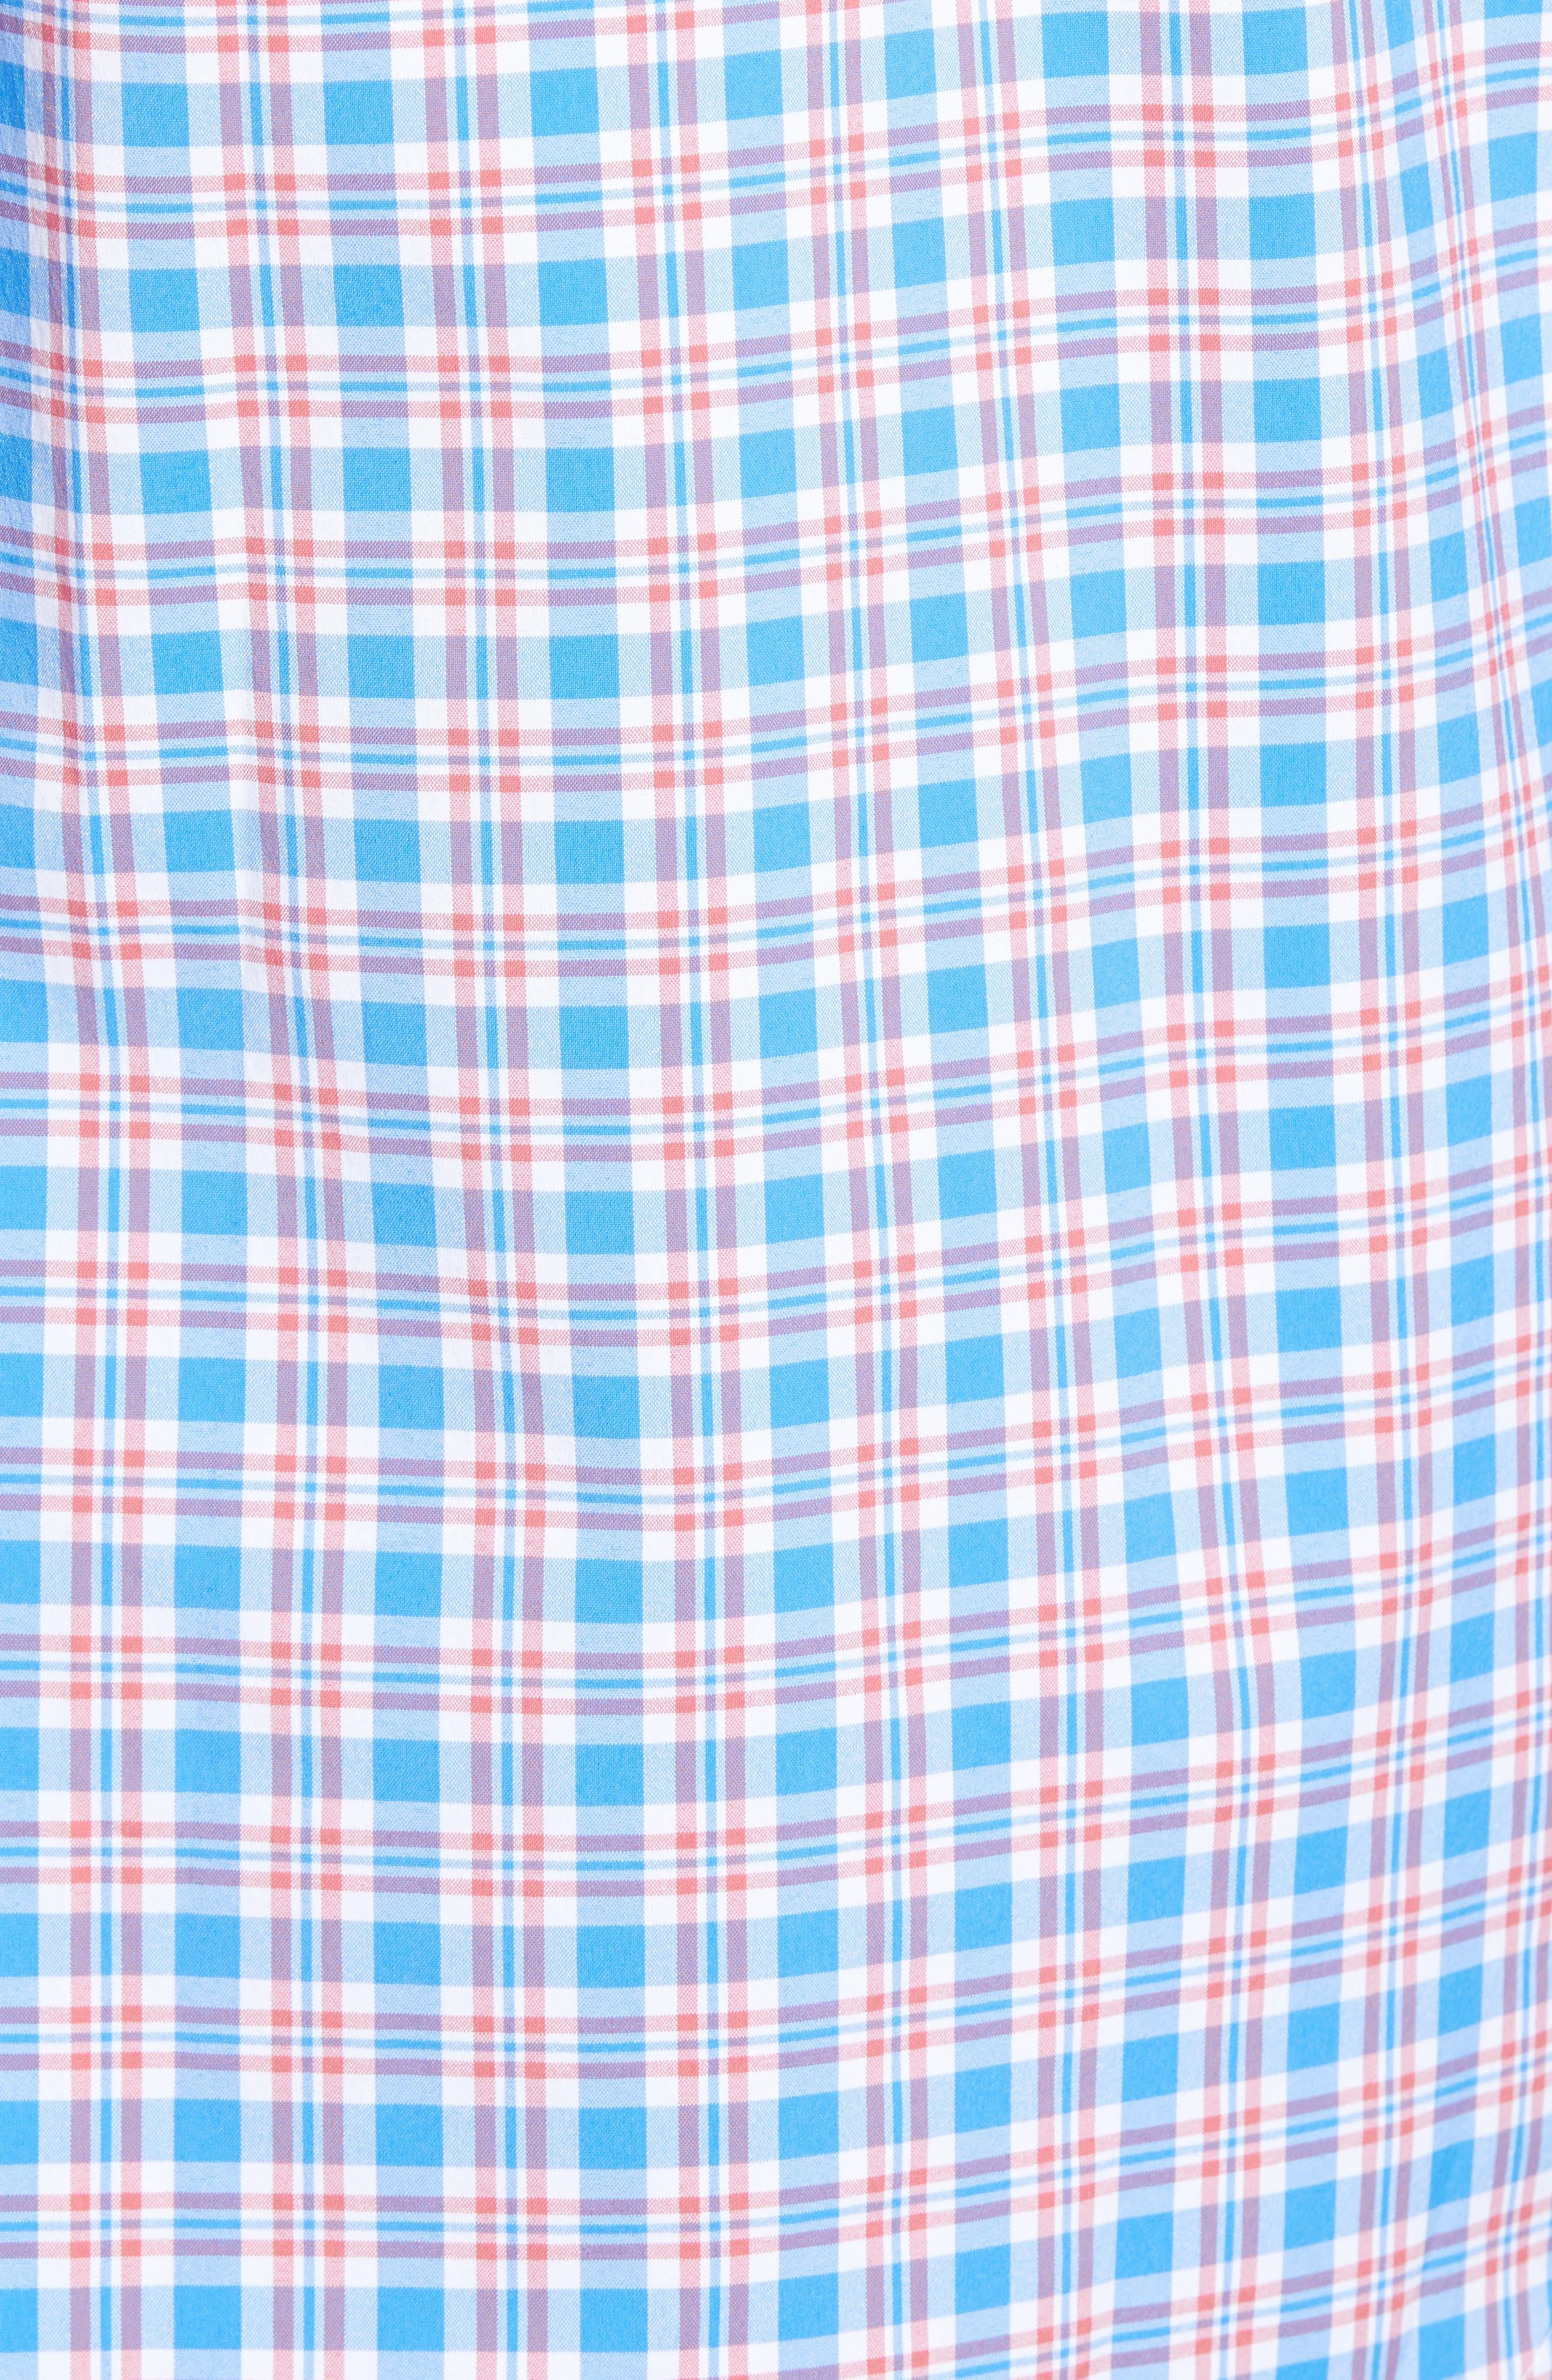 VINEYARD VINES,                             Lighthouse Road Regular Fit Plaid Sport Shirt,                             Alternate thumbnail 5, color,                             415